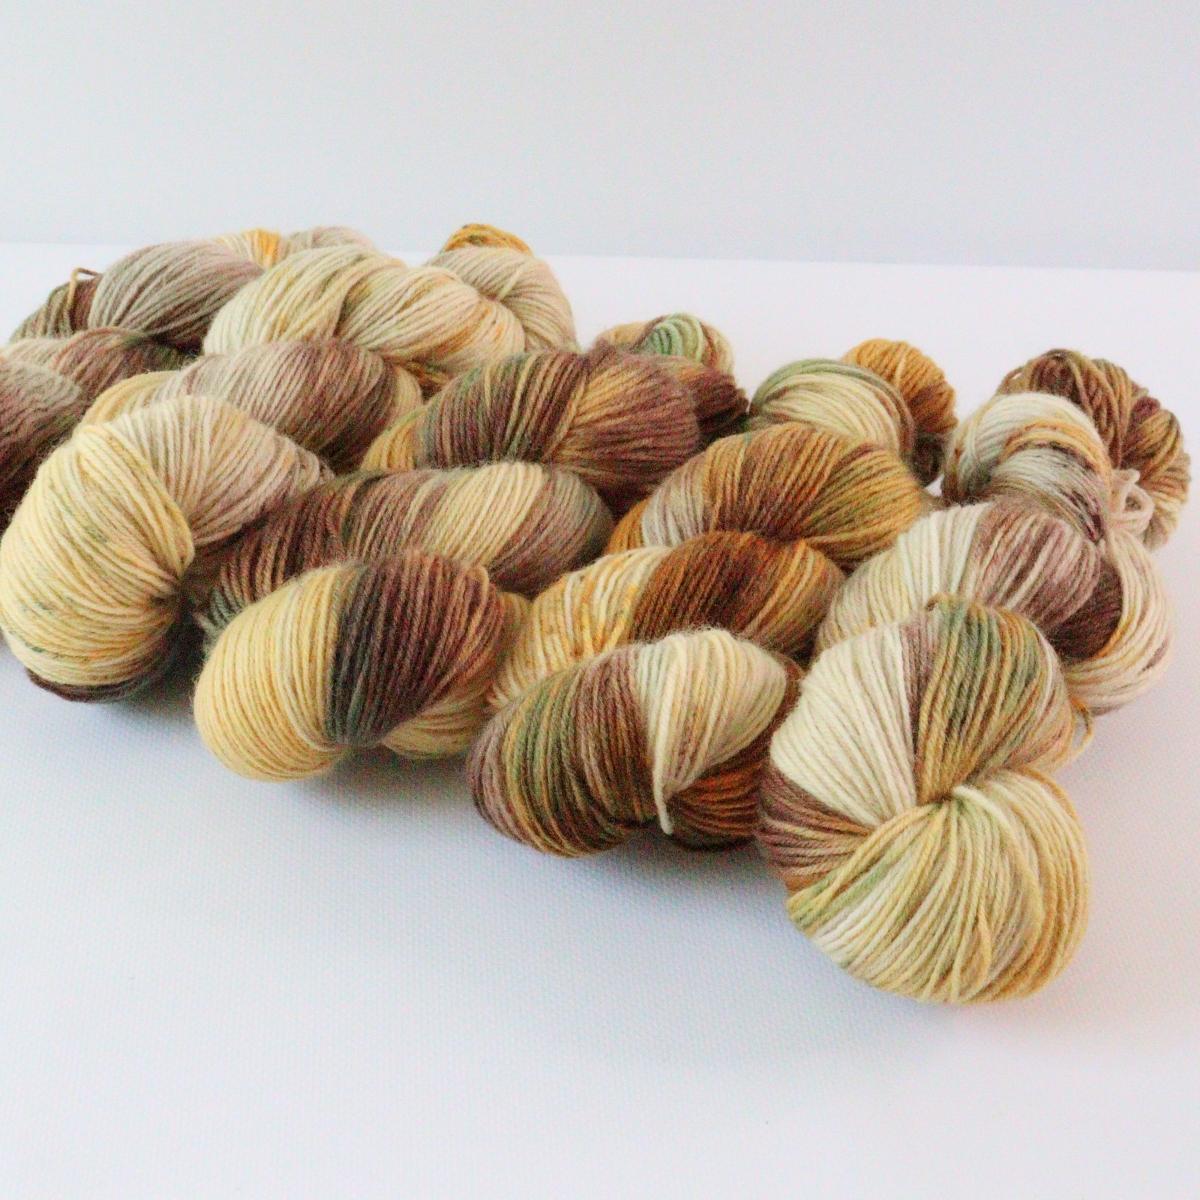 woodico.pro hand dyed yarn 088 4 1200x1200 - Hand dyed yarn / 088